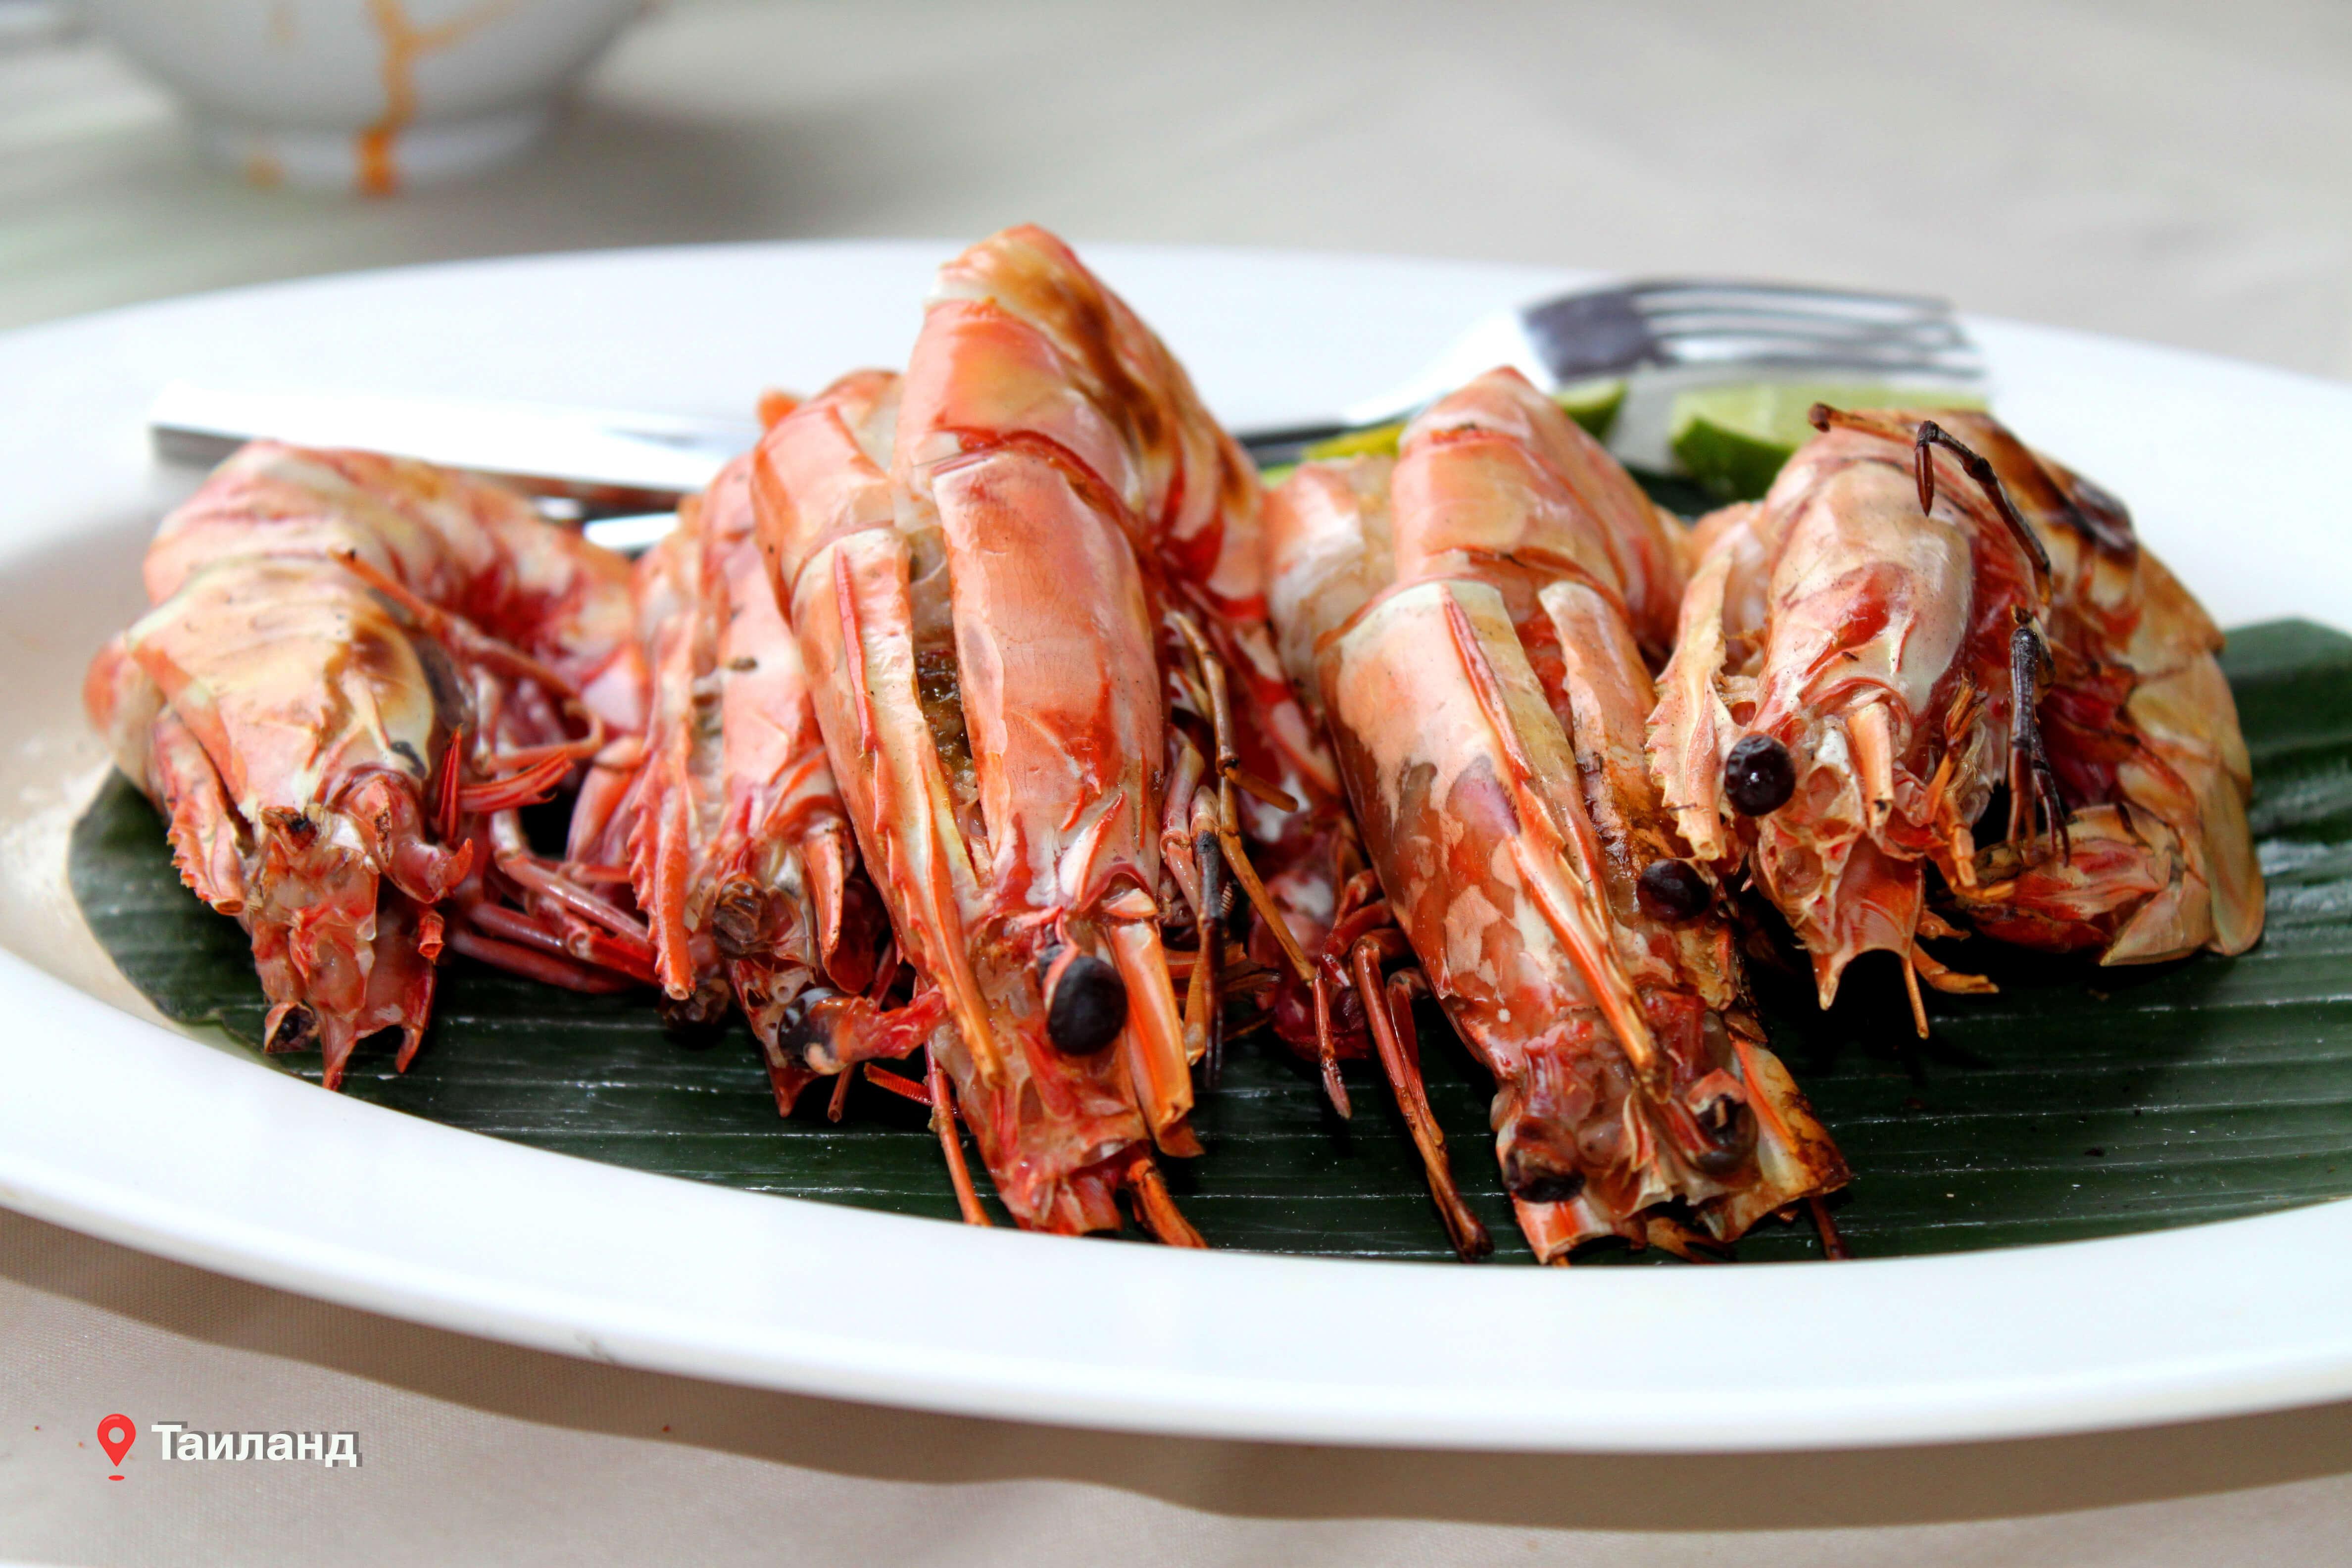 Кухня Таиланда, королевские креветки.